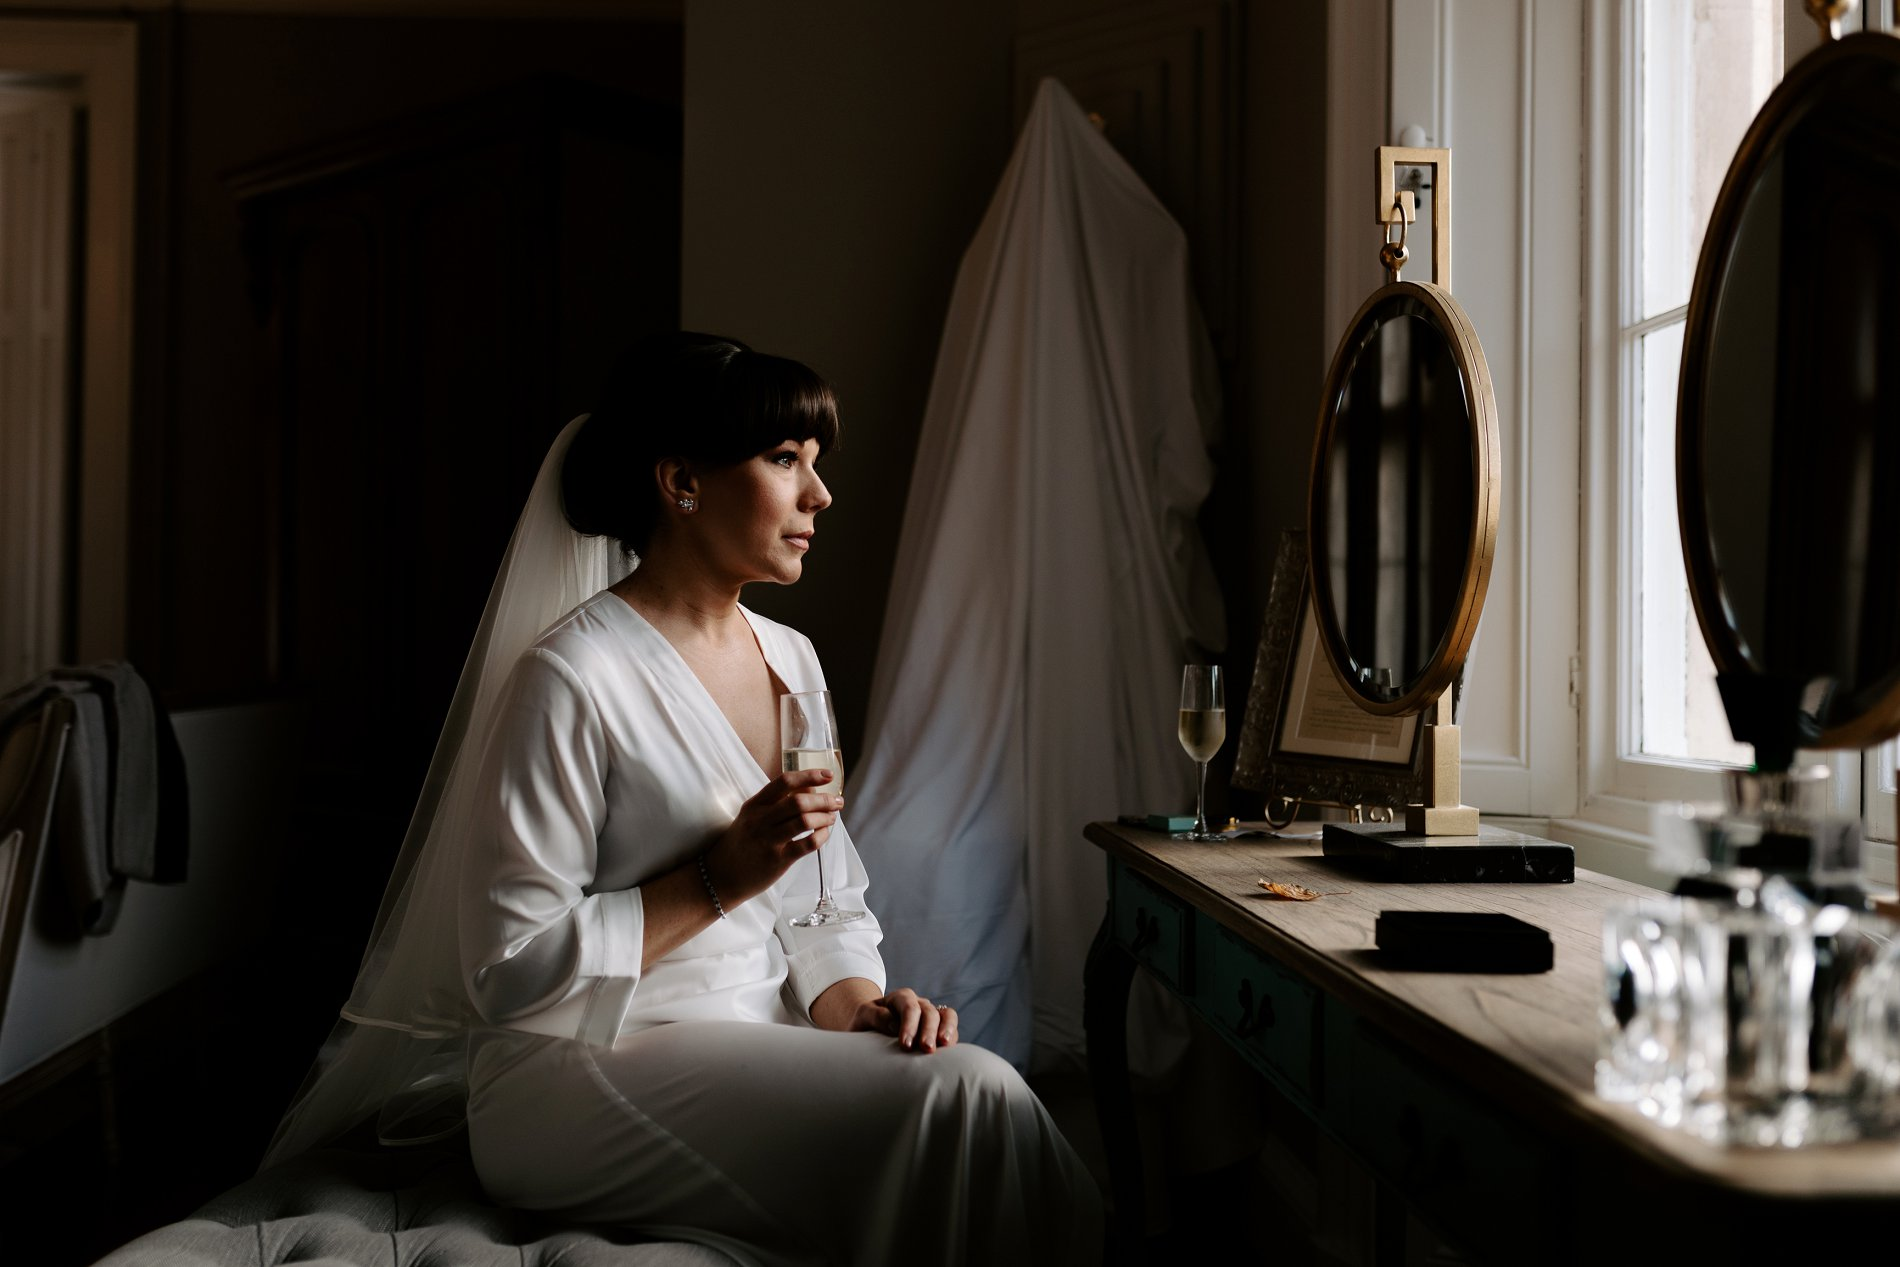 An Elegant White Wedding at Thicket Priory (c) Carla Whittingham Photography (24)